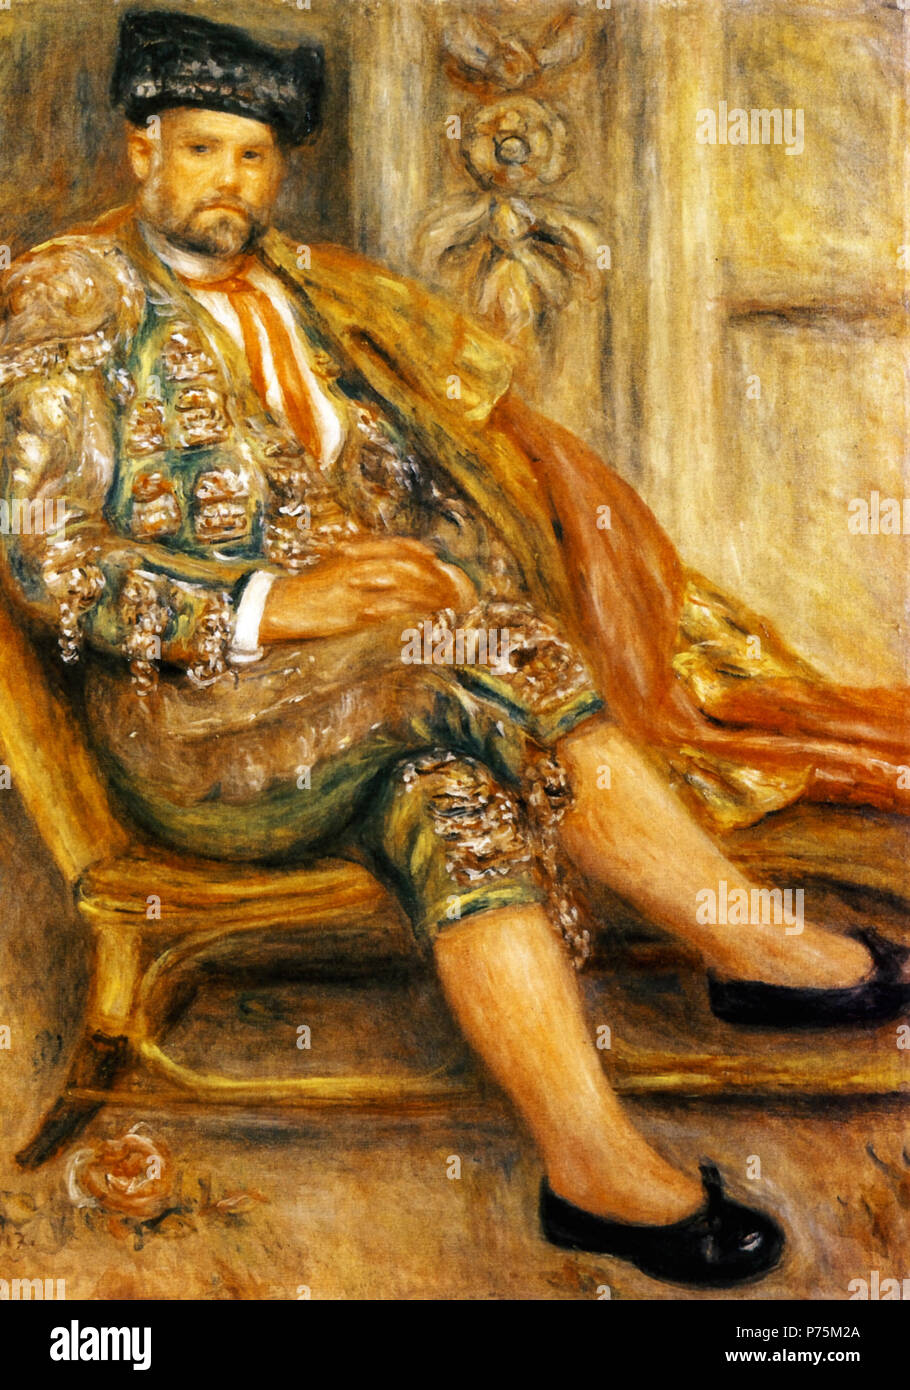 . Portrait of Ambroise Vollard  1917 6 Ambroise Vollard by Pierre-Auguste Renoir - Stock Image